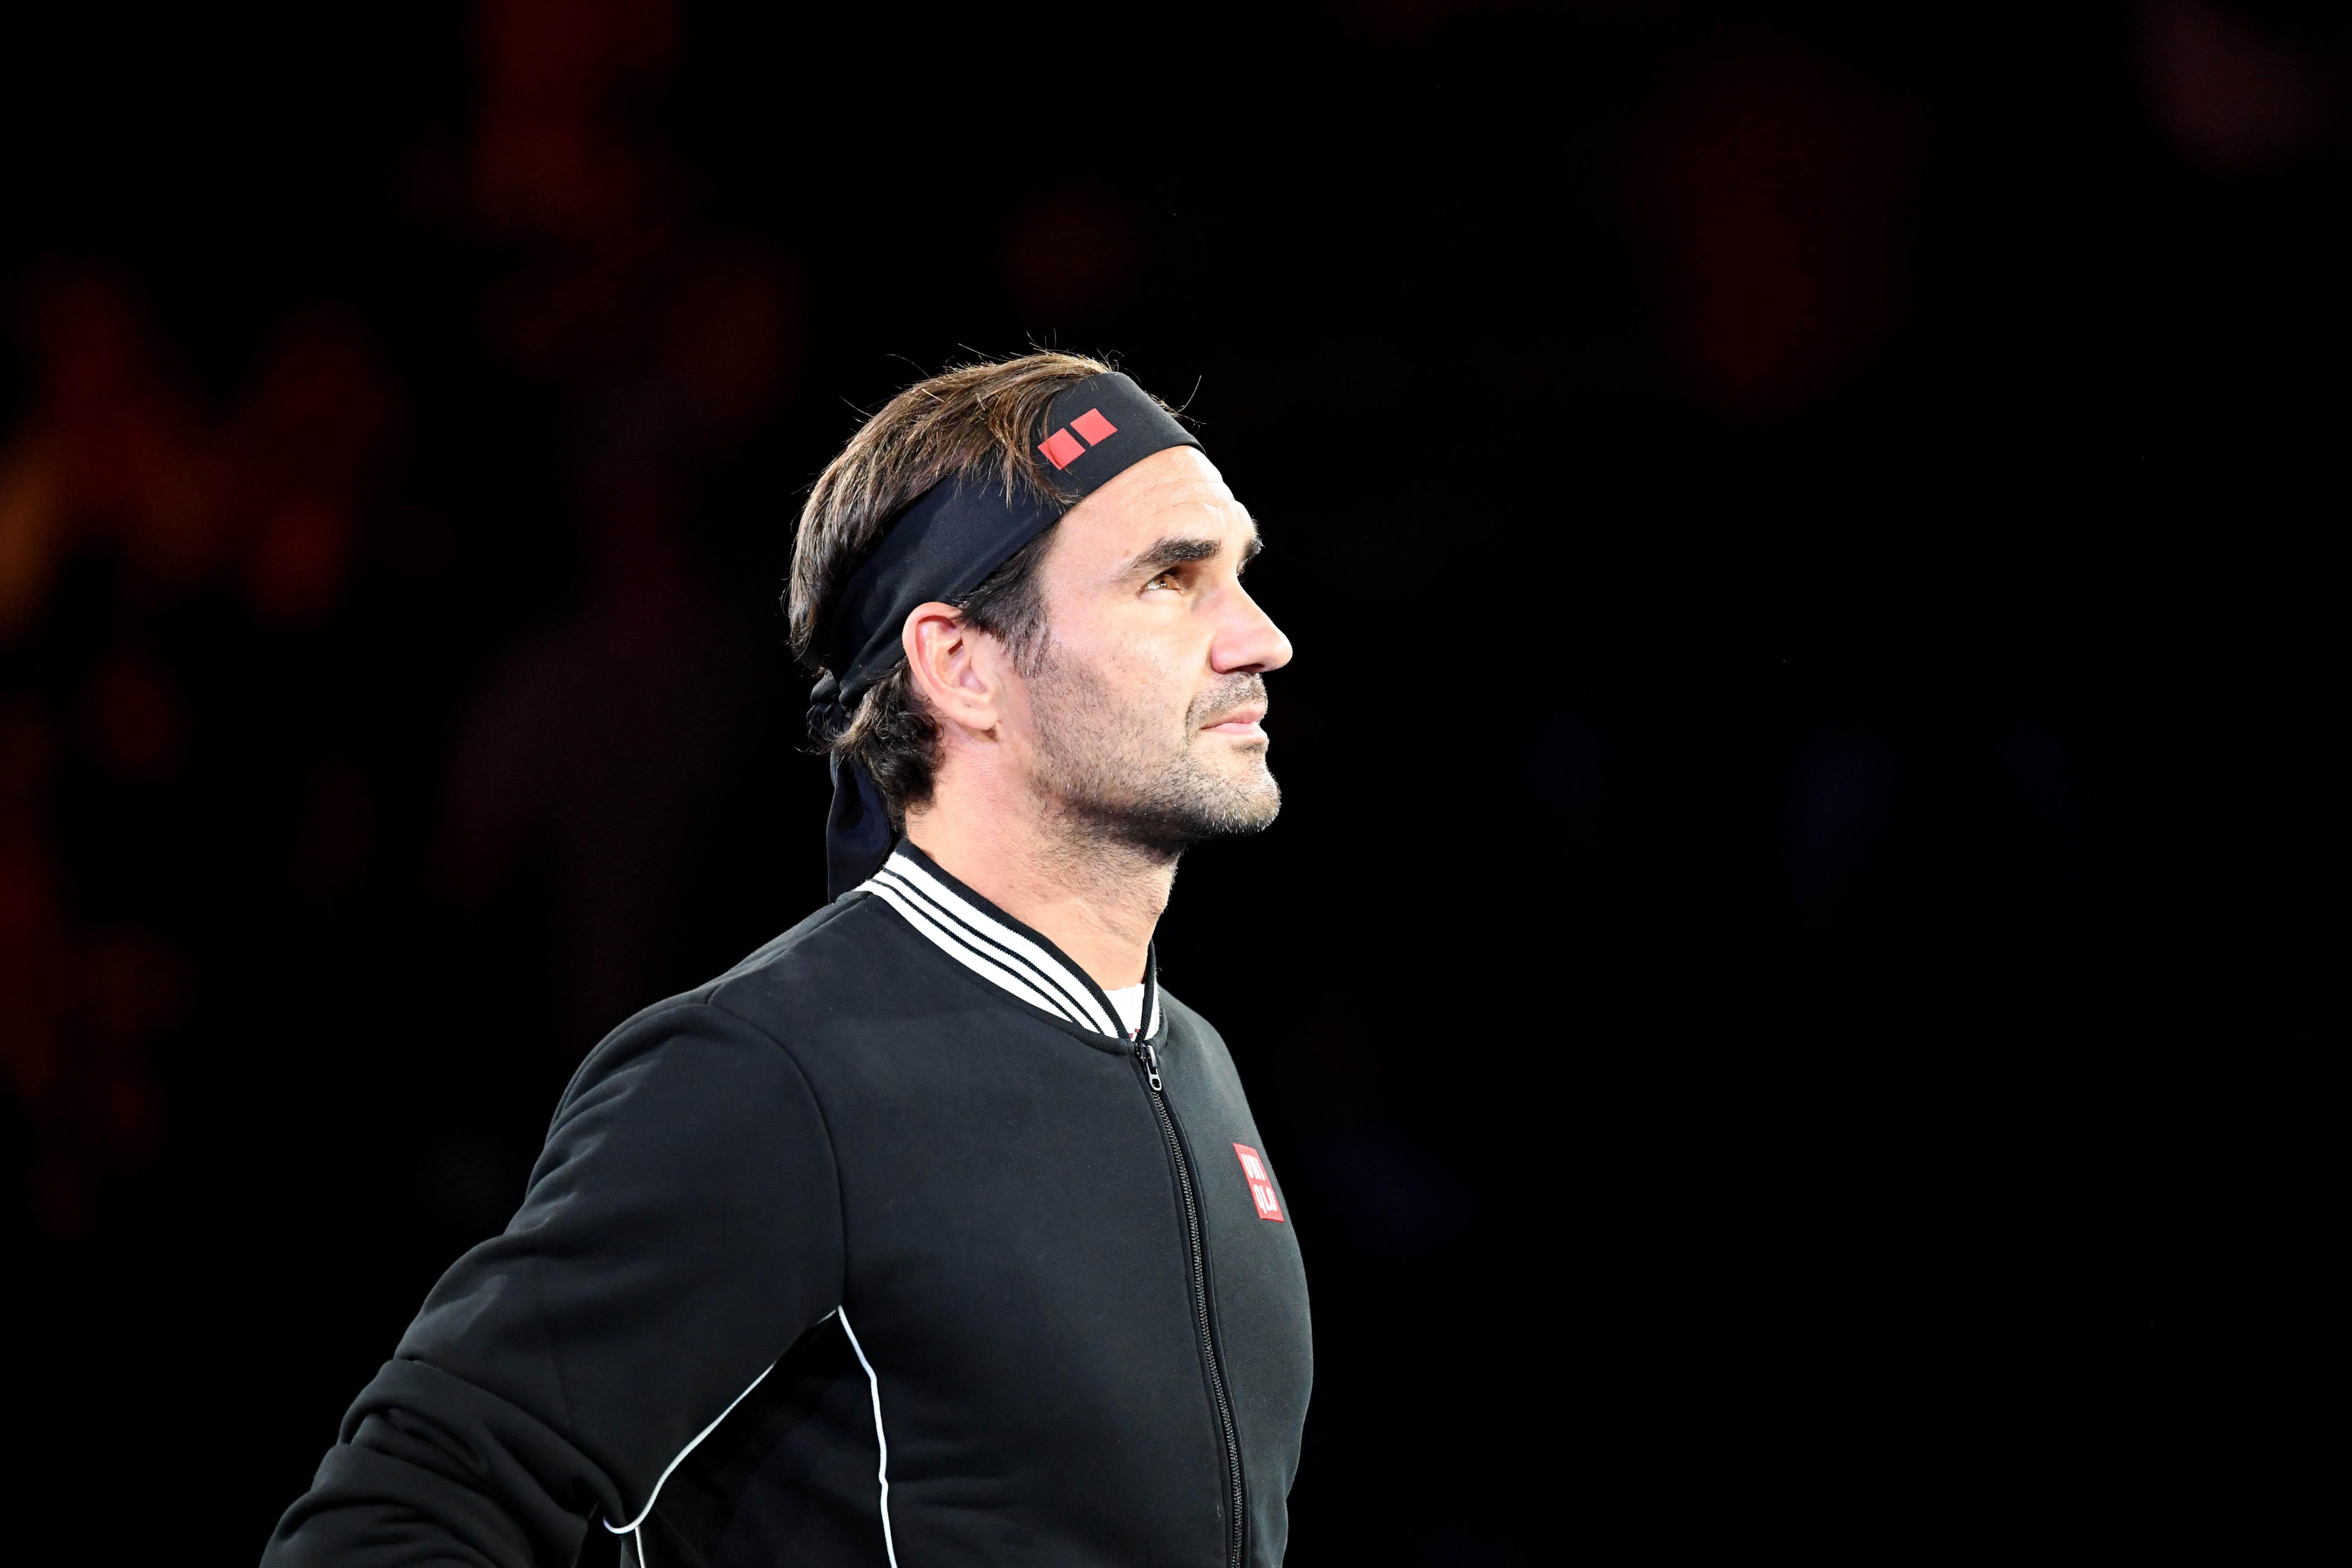 """Means a lot to me"": Rafael Nadal on winning fifth Mubadala title"